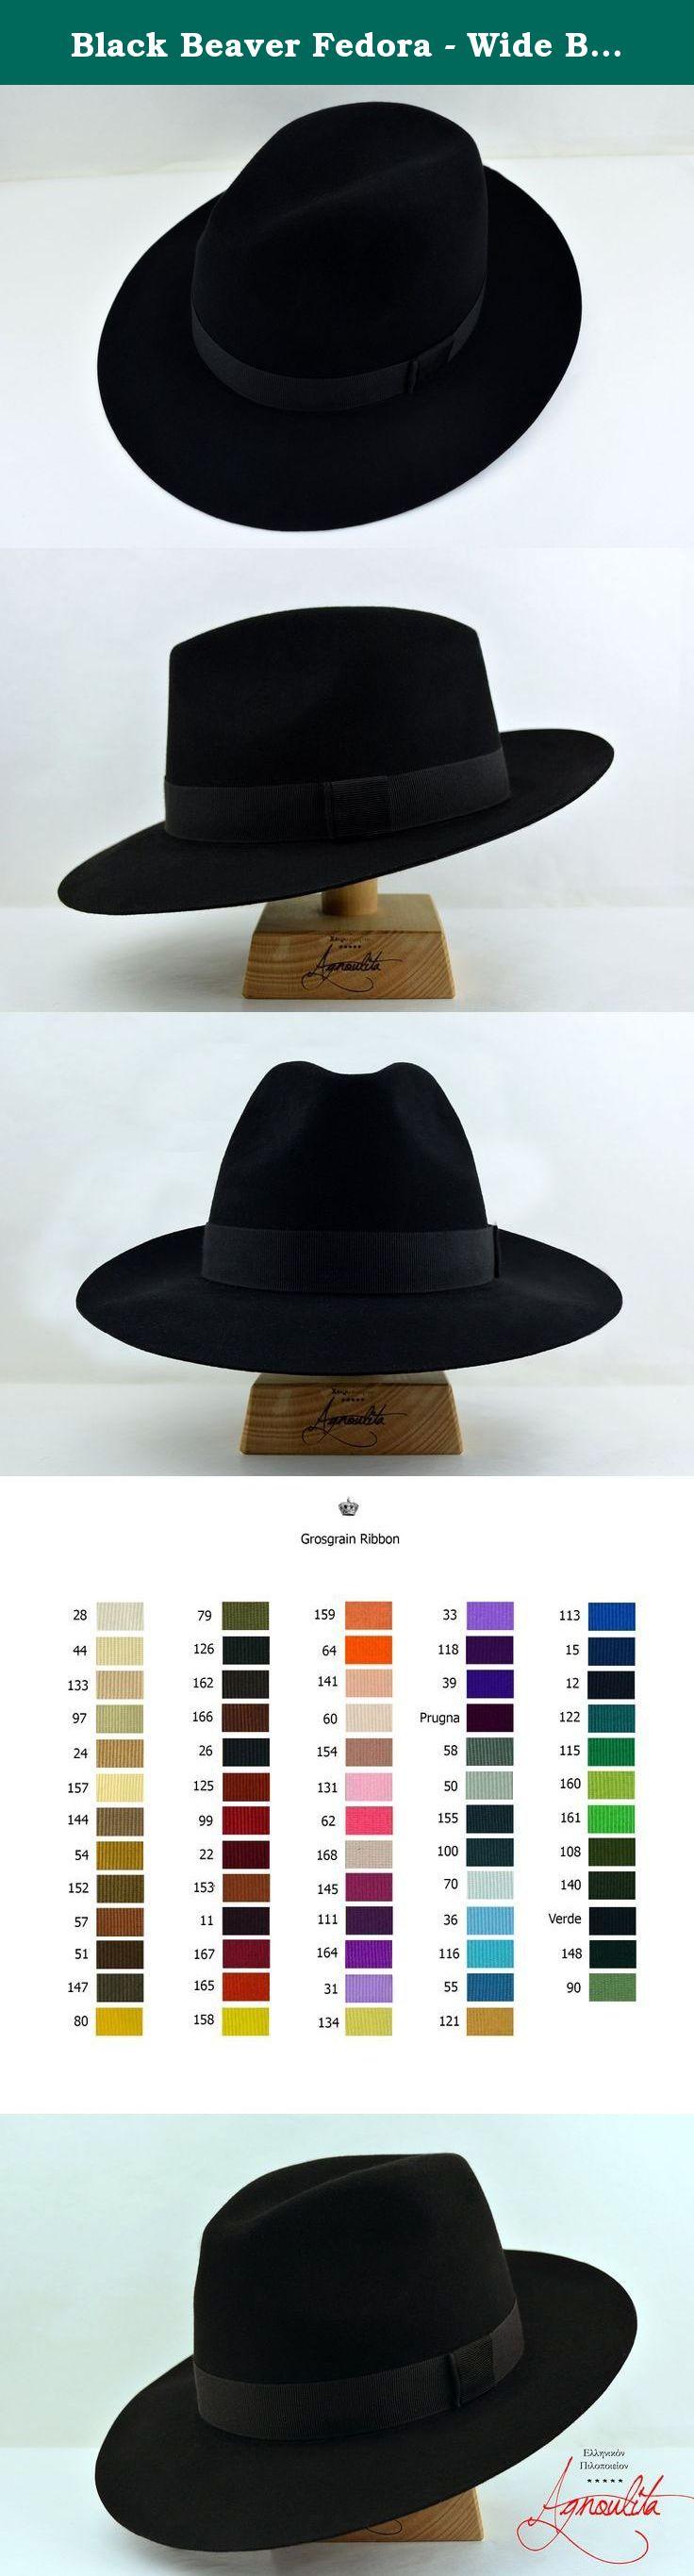 Black Beaver Fedora - Wide Brim Pure Beaver Fur Felt Handmade Fedora Hat -  Men Women 610a0fba3a1d